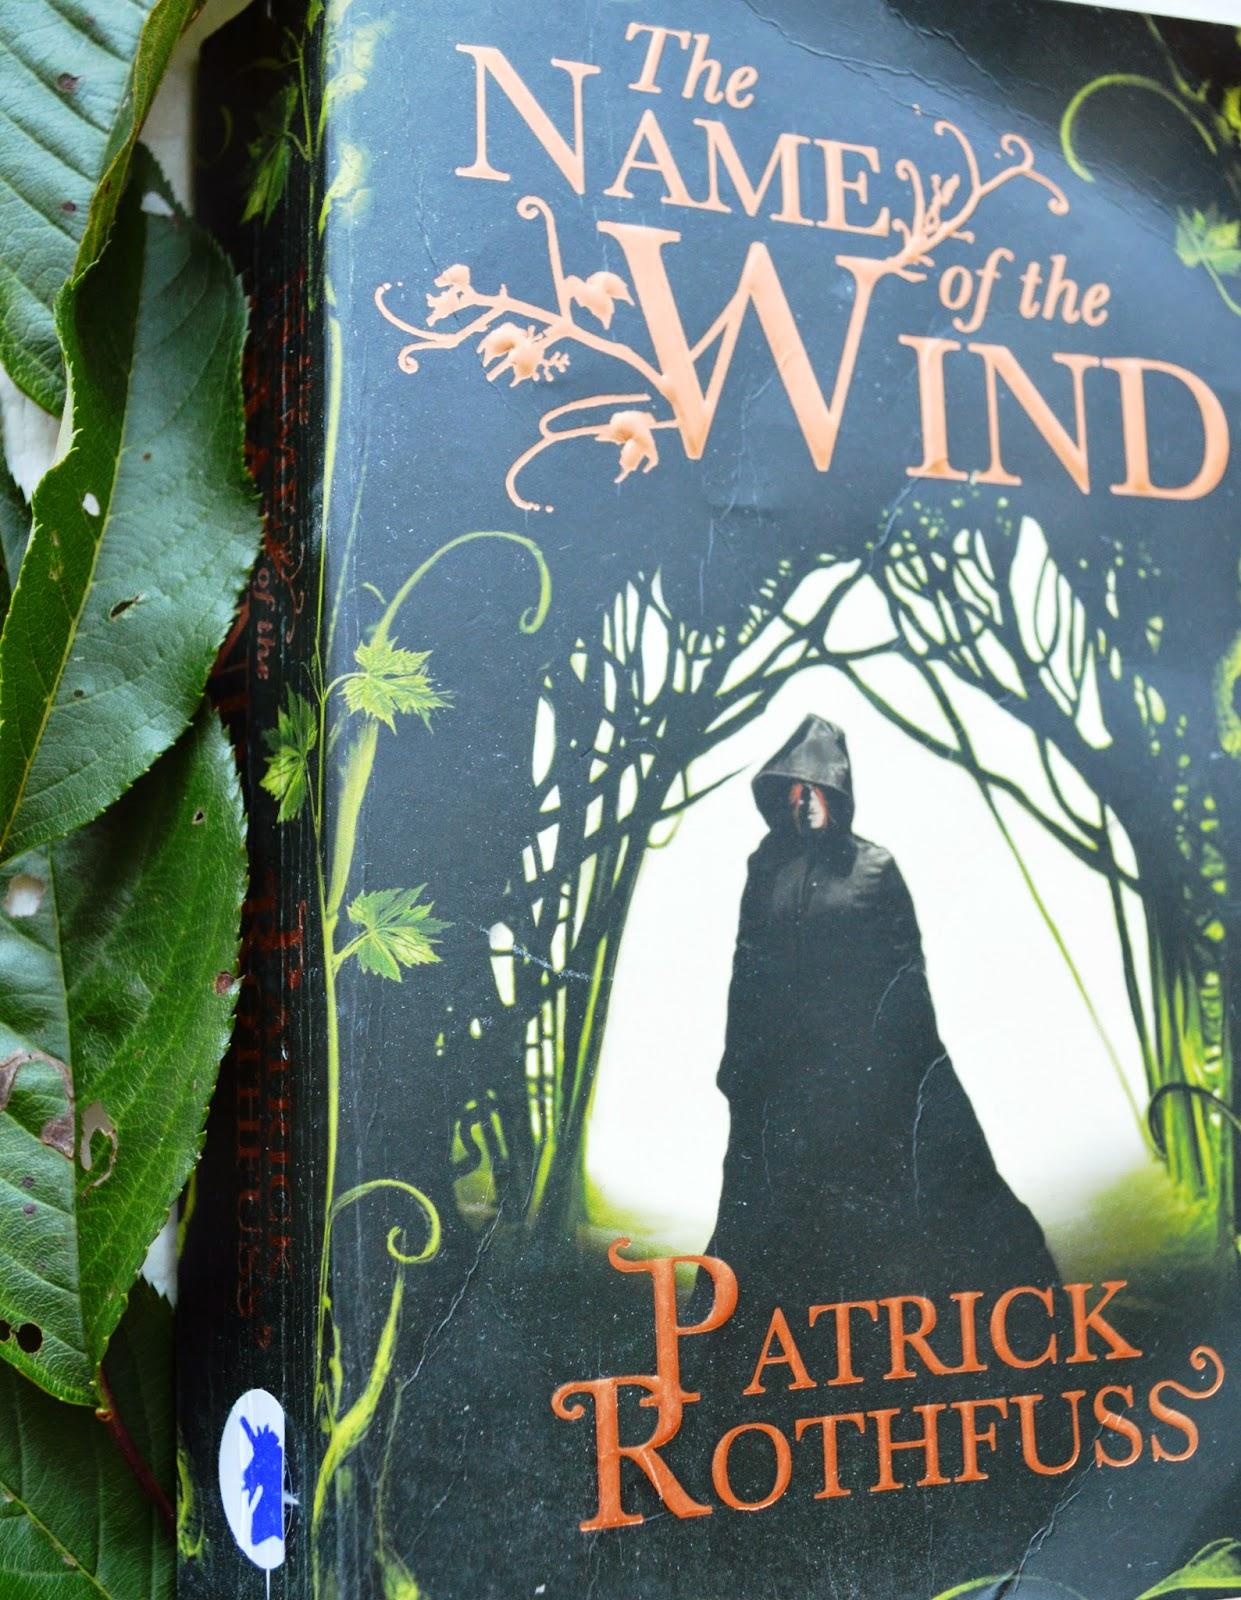 paperback, review, The Name of the Wind, Patrick Rothfuss, book, fantasy, KingKiller Chronicles, Kvothe, magic, school, university, education, spirits, UK edition, saga,